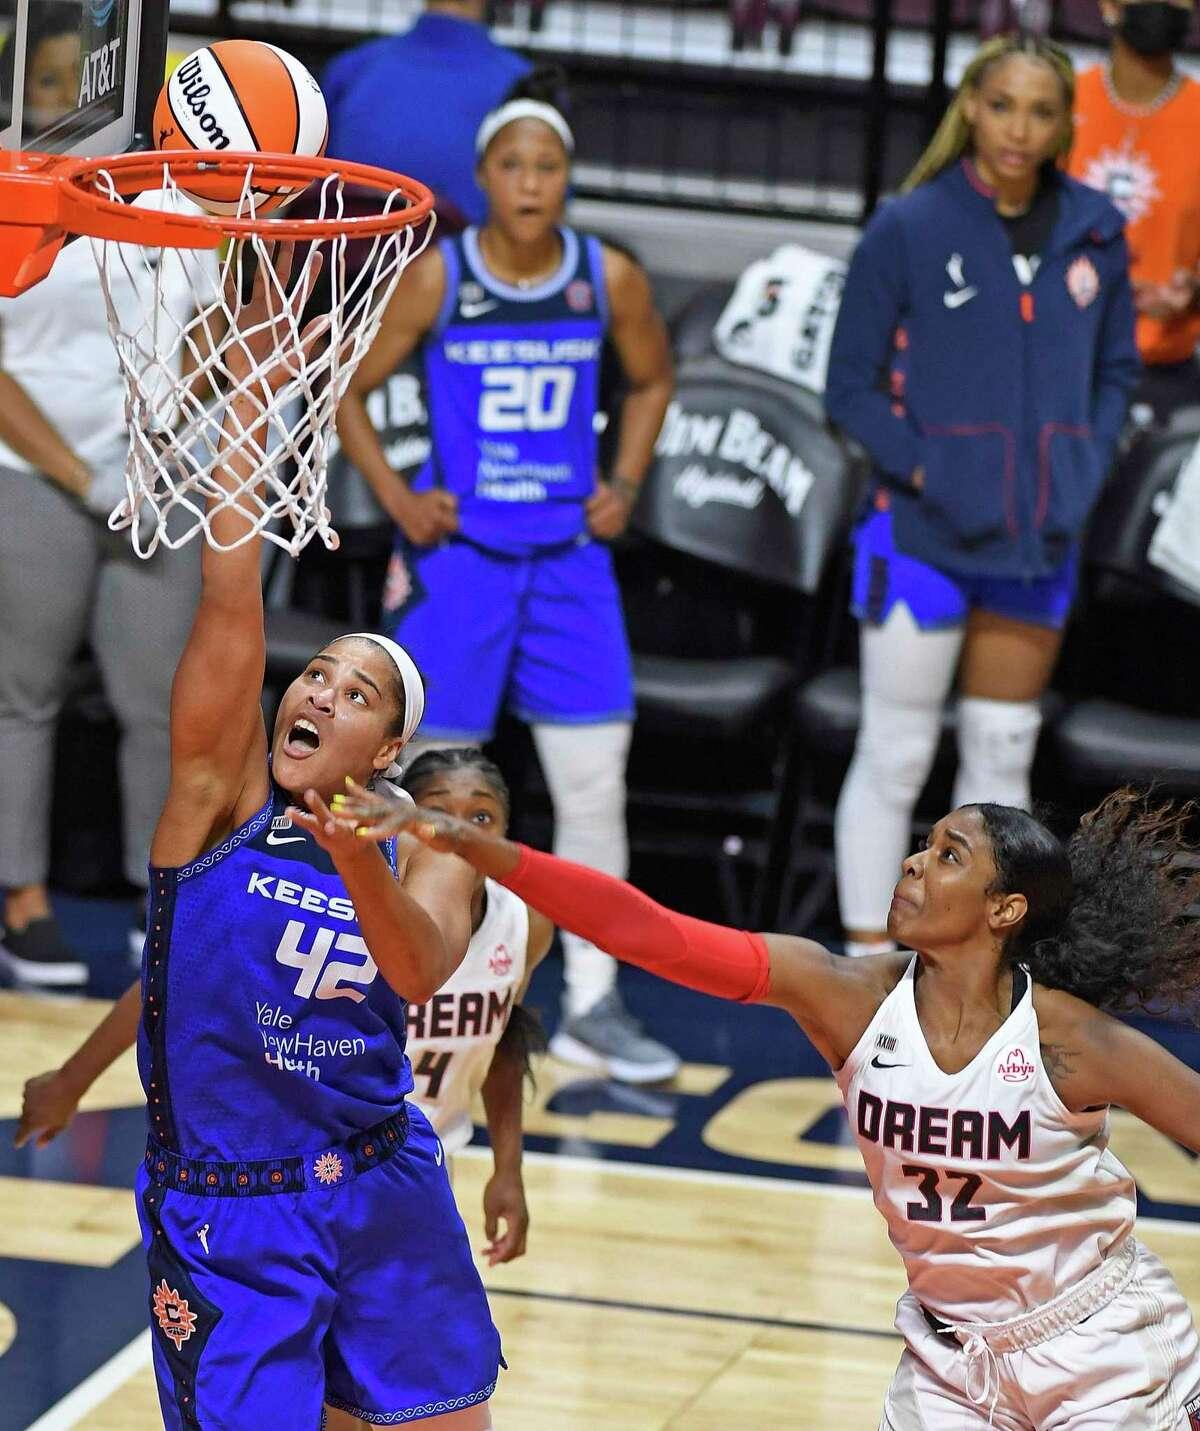 Connecticut Sun center Brionna Jones (42) scores around the defense of Atlanta Dream forward Cheyenne Parker (32) during a WNBA basketball game Friday, July 9, 2021, in Uncasville, Conn. (Sean D. Elliot/The Day via AP)